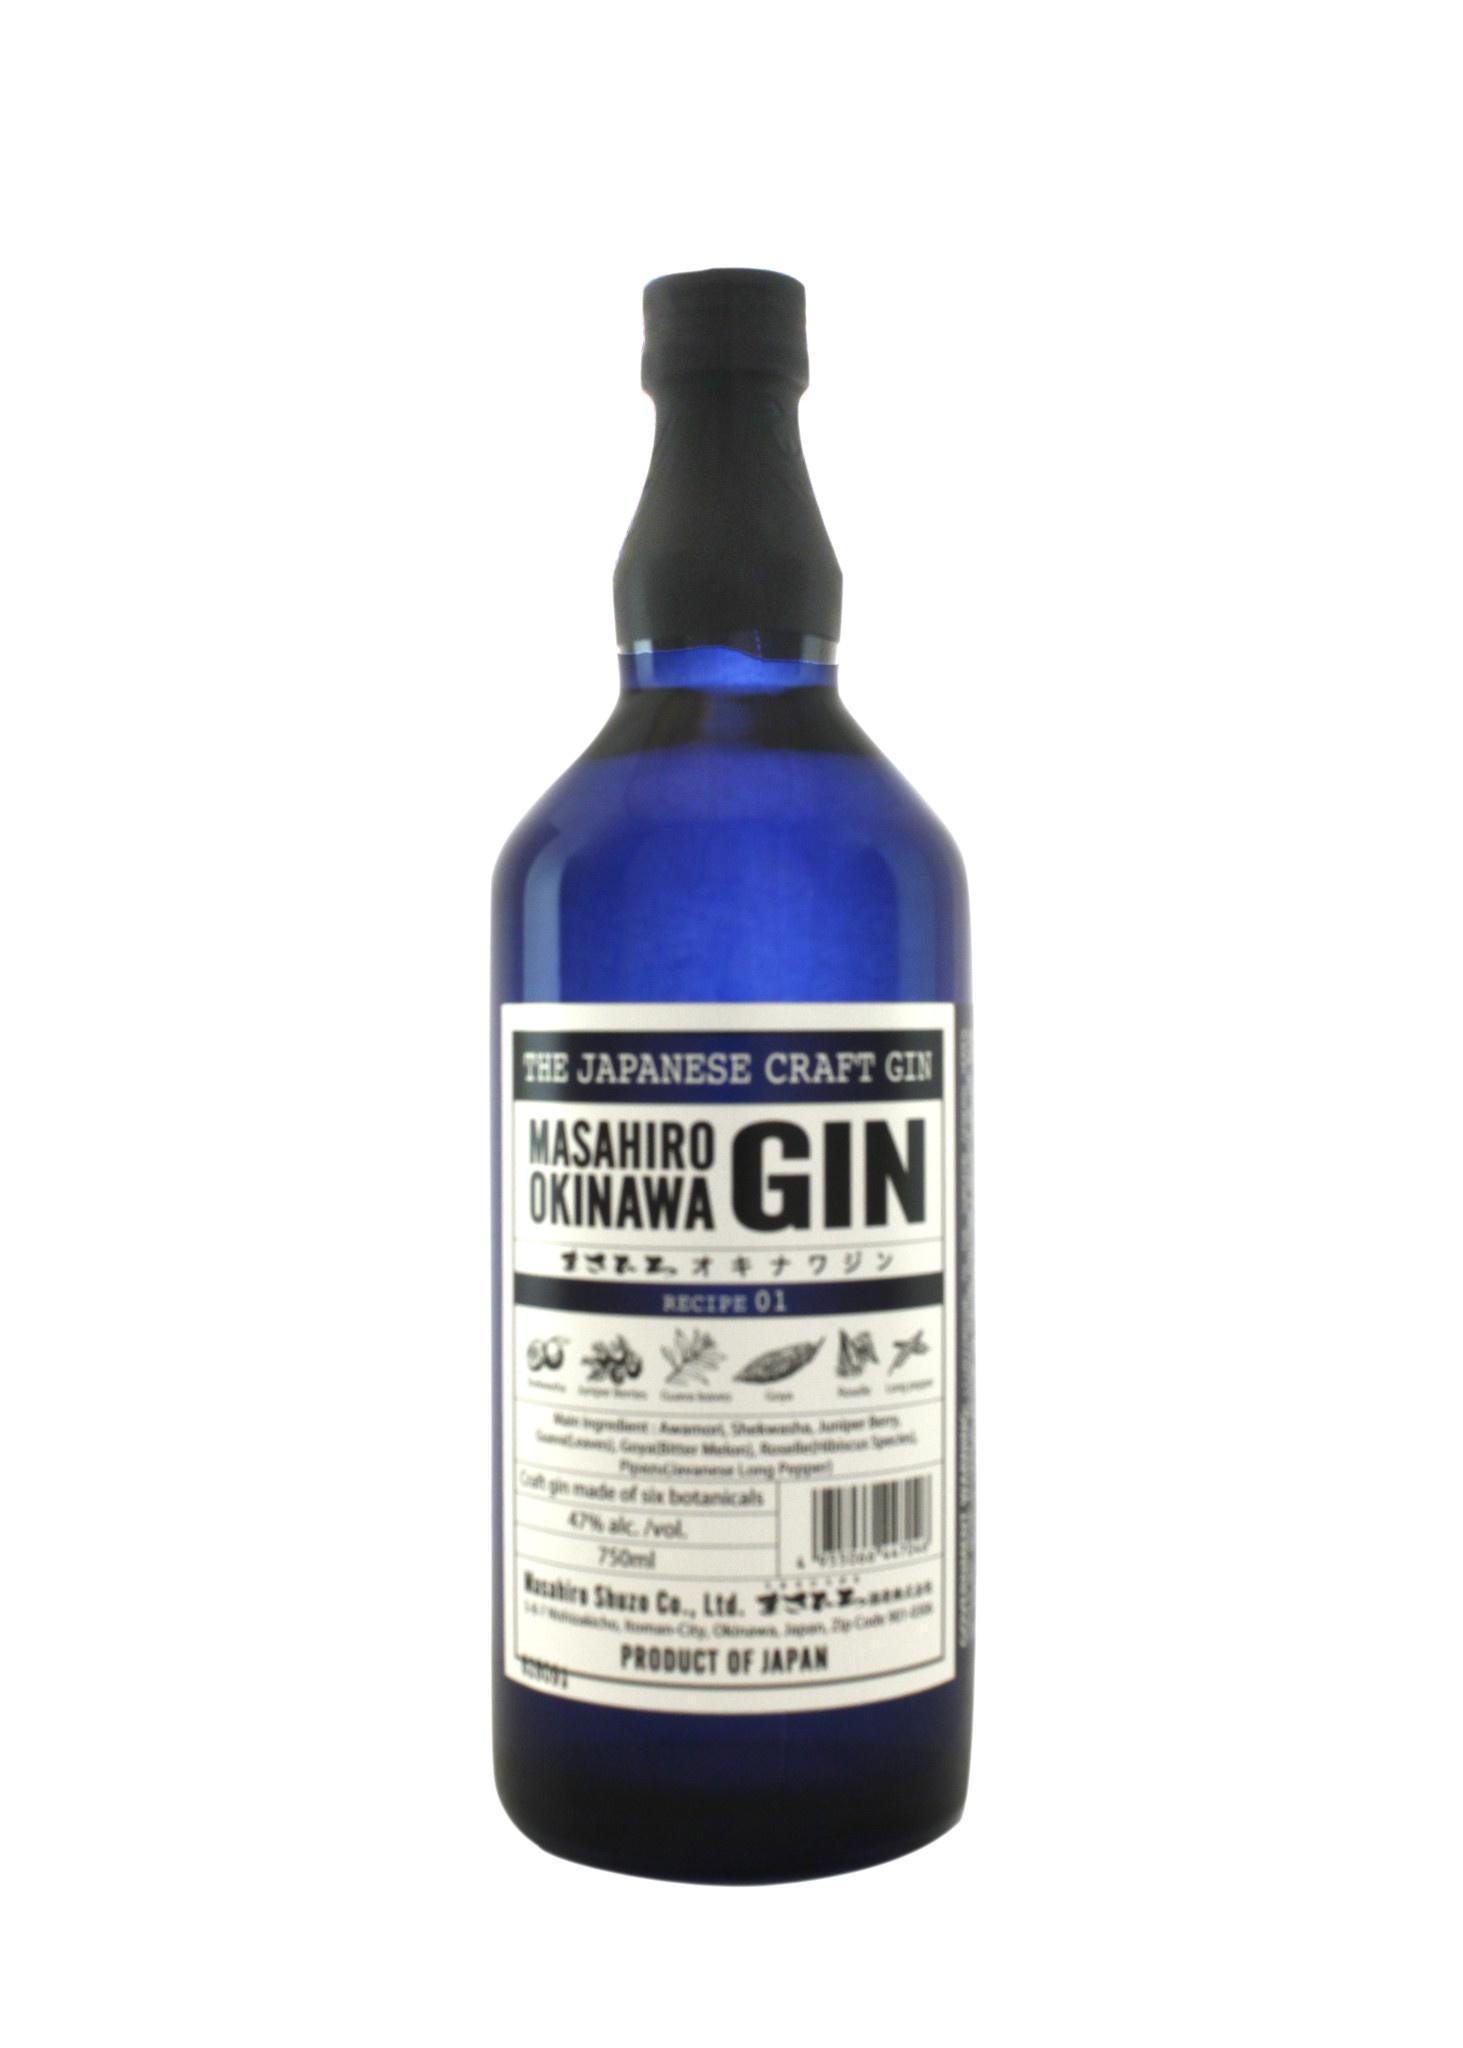 Masahiro Okinawa Gin, Recipe 01, Japan